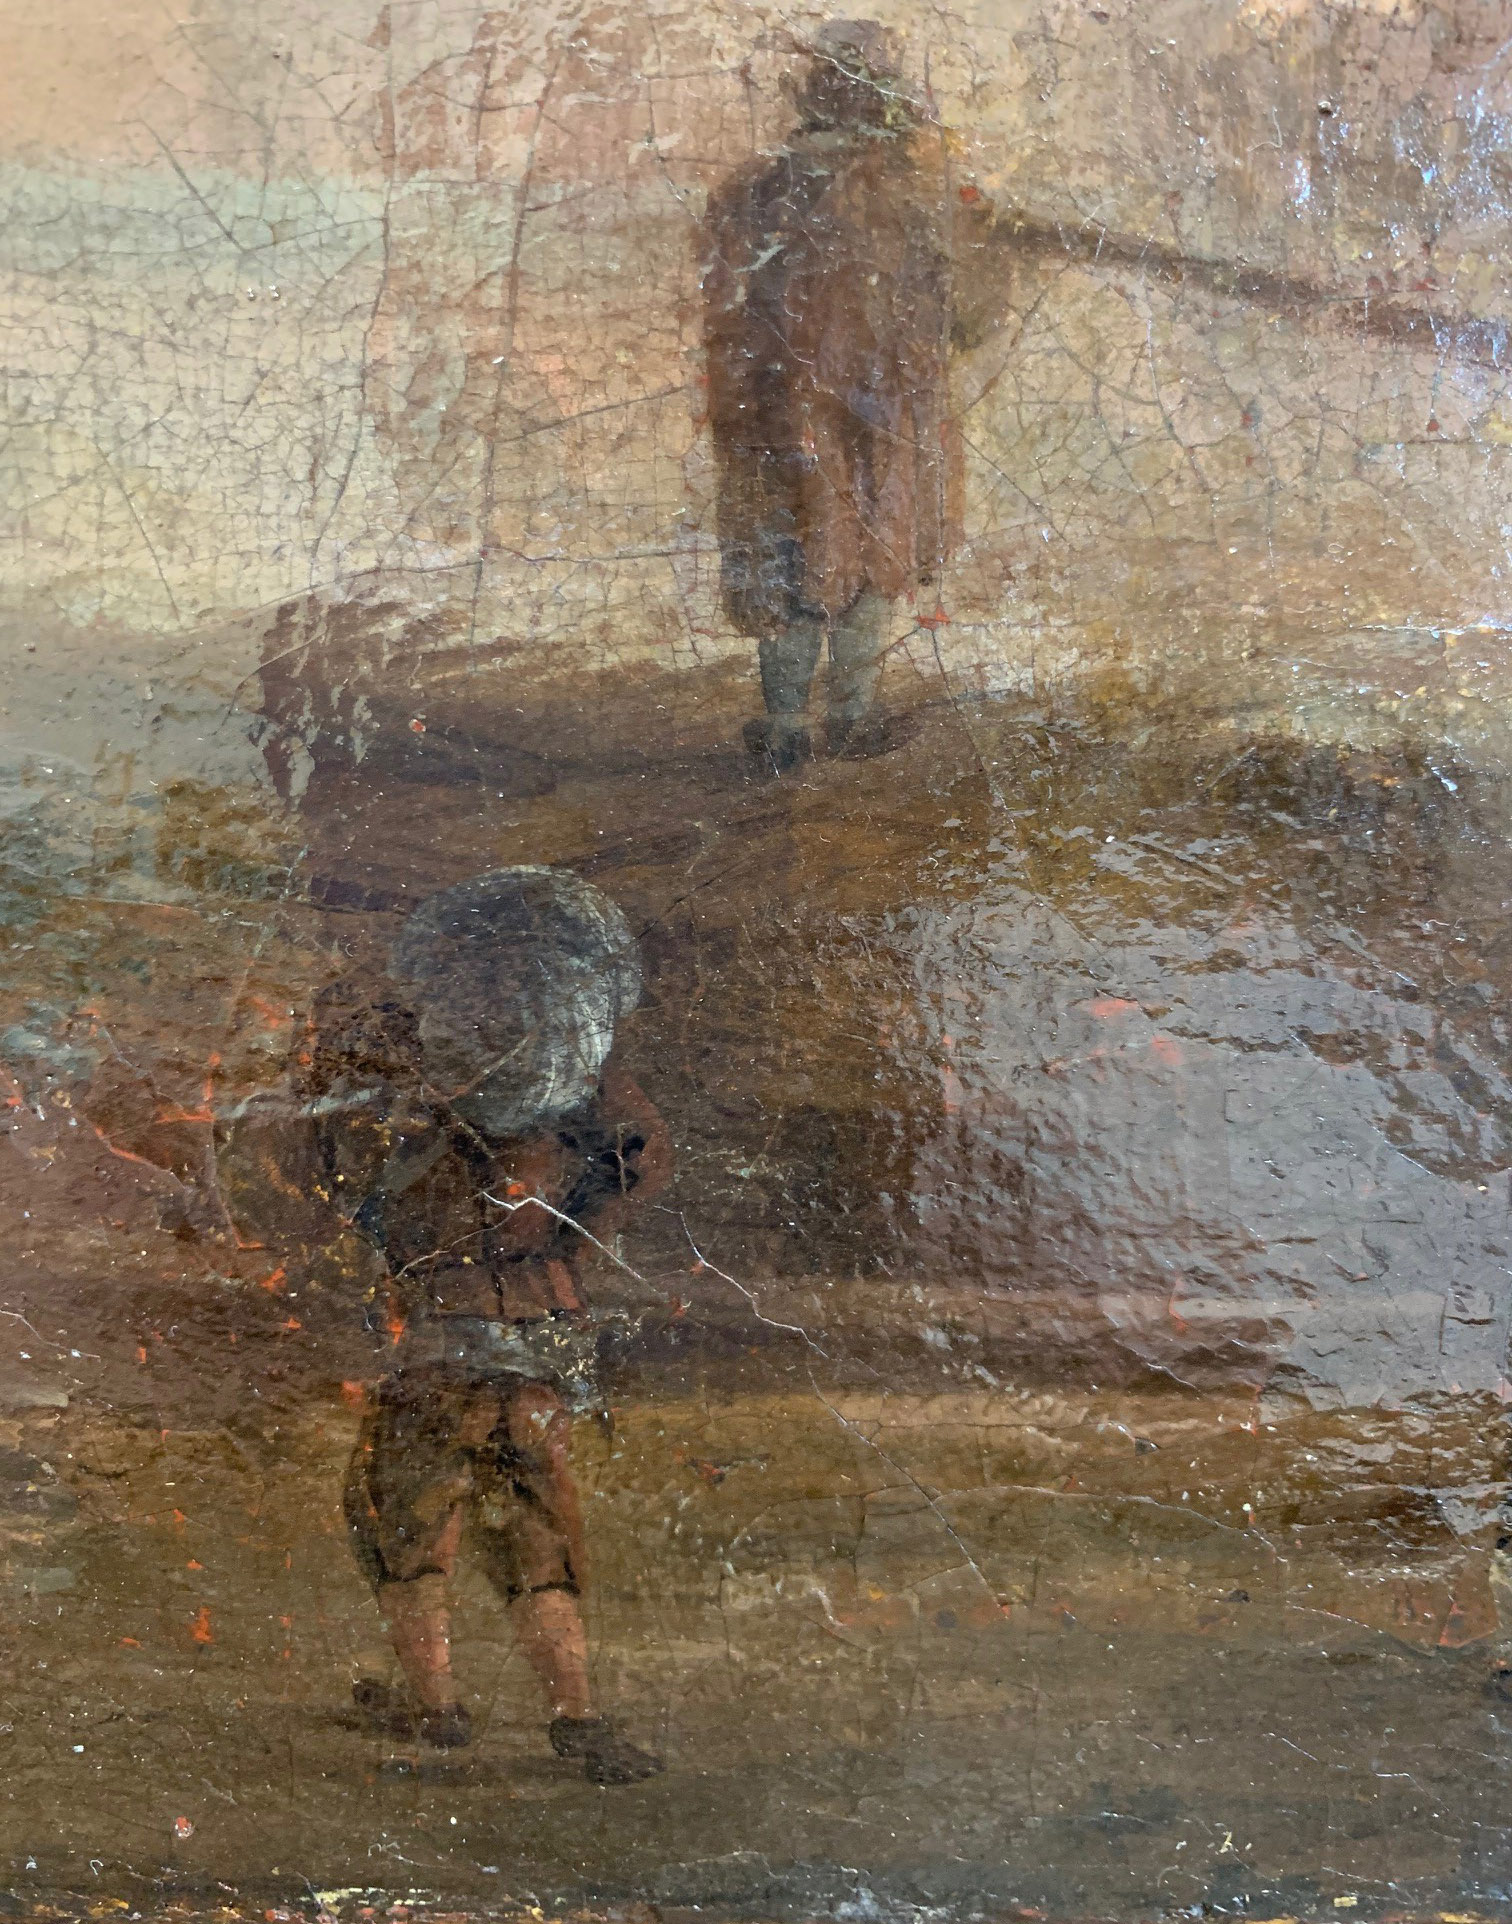 CIRCLE OF JAN VAN GOYEN, LEIDEN, 1596 - 1656, THE HAGUE, 17TH CENTURY OIL ON CANVAS River landscape, - Image 7 of 12